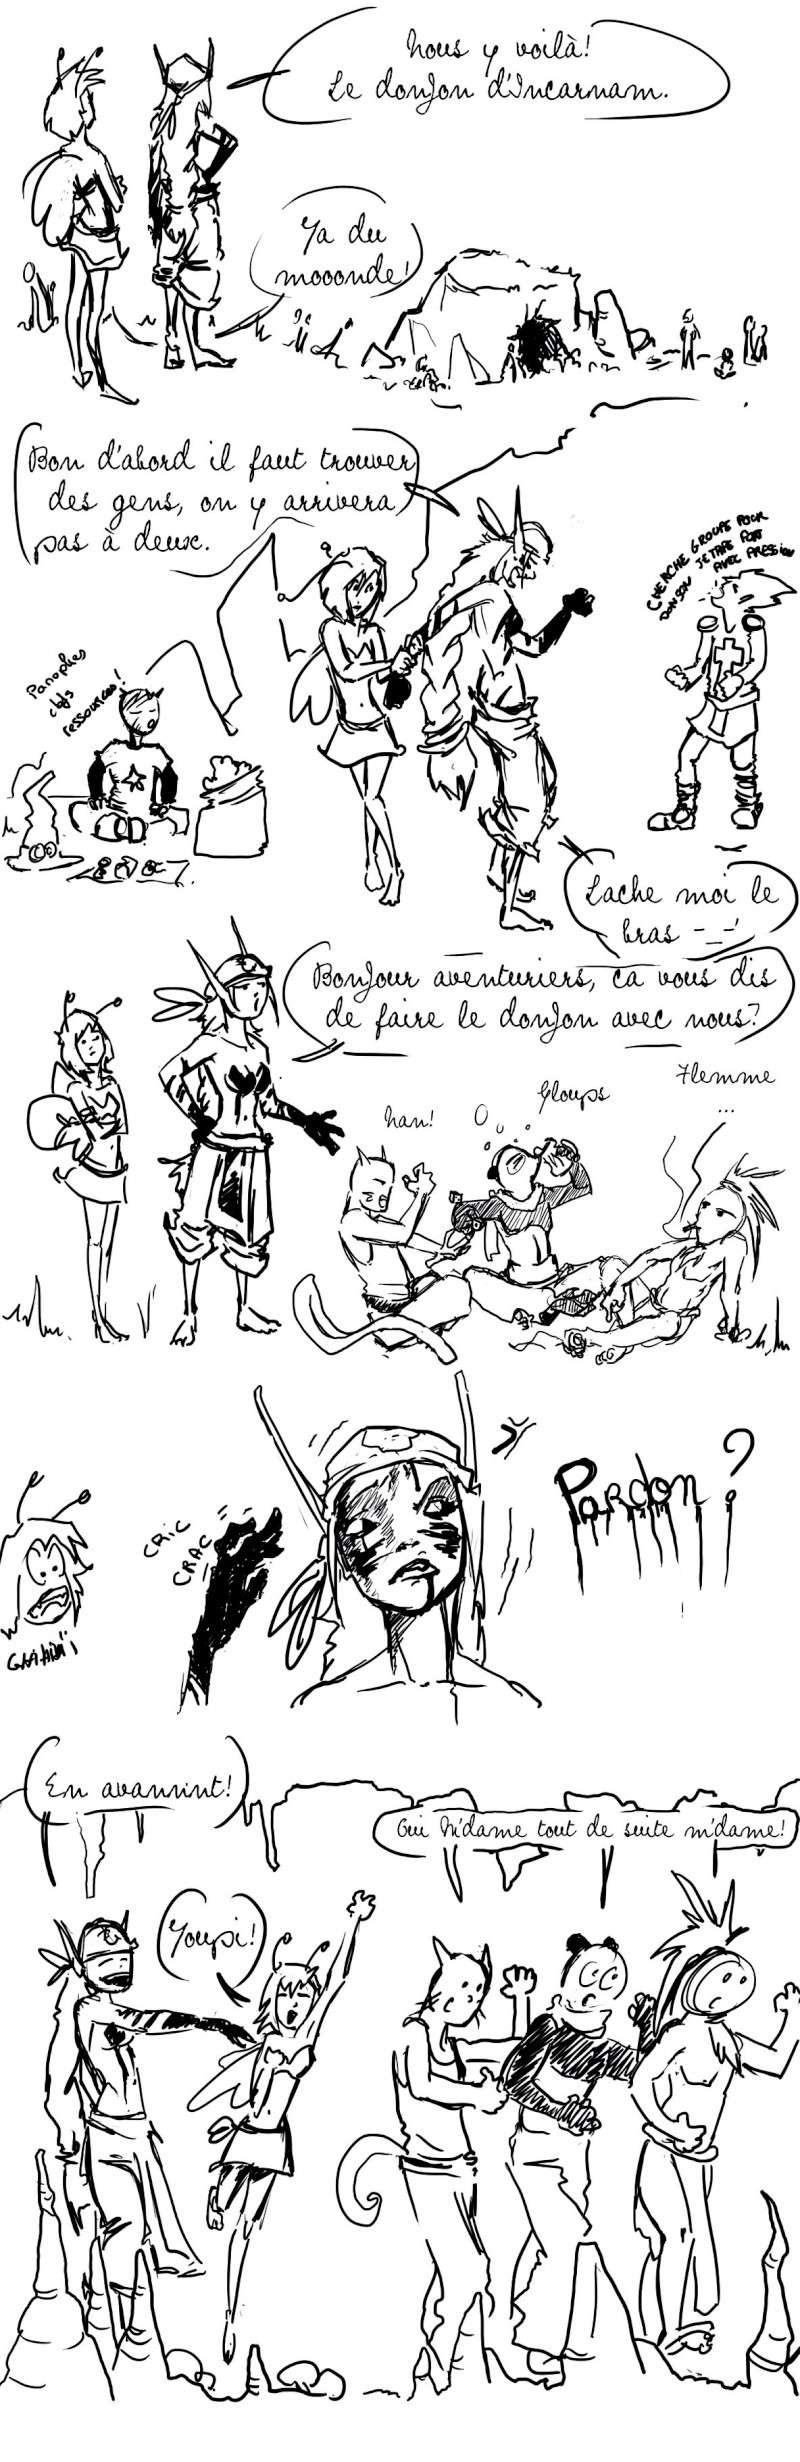 seik et ekis, les aventures ILLUSTREES - Page 5 Strip810